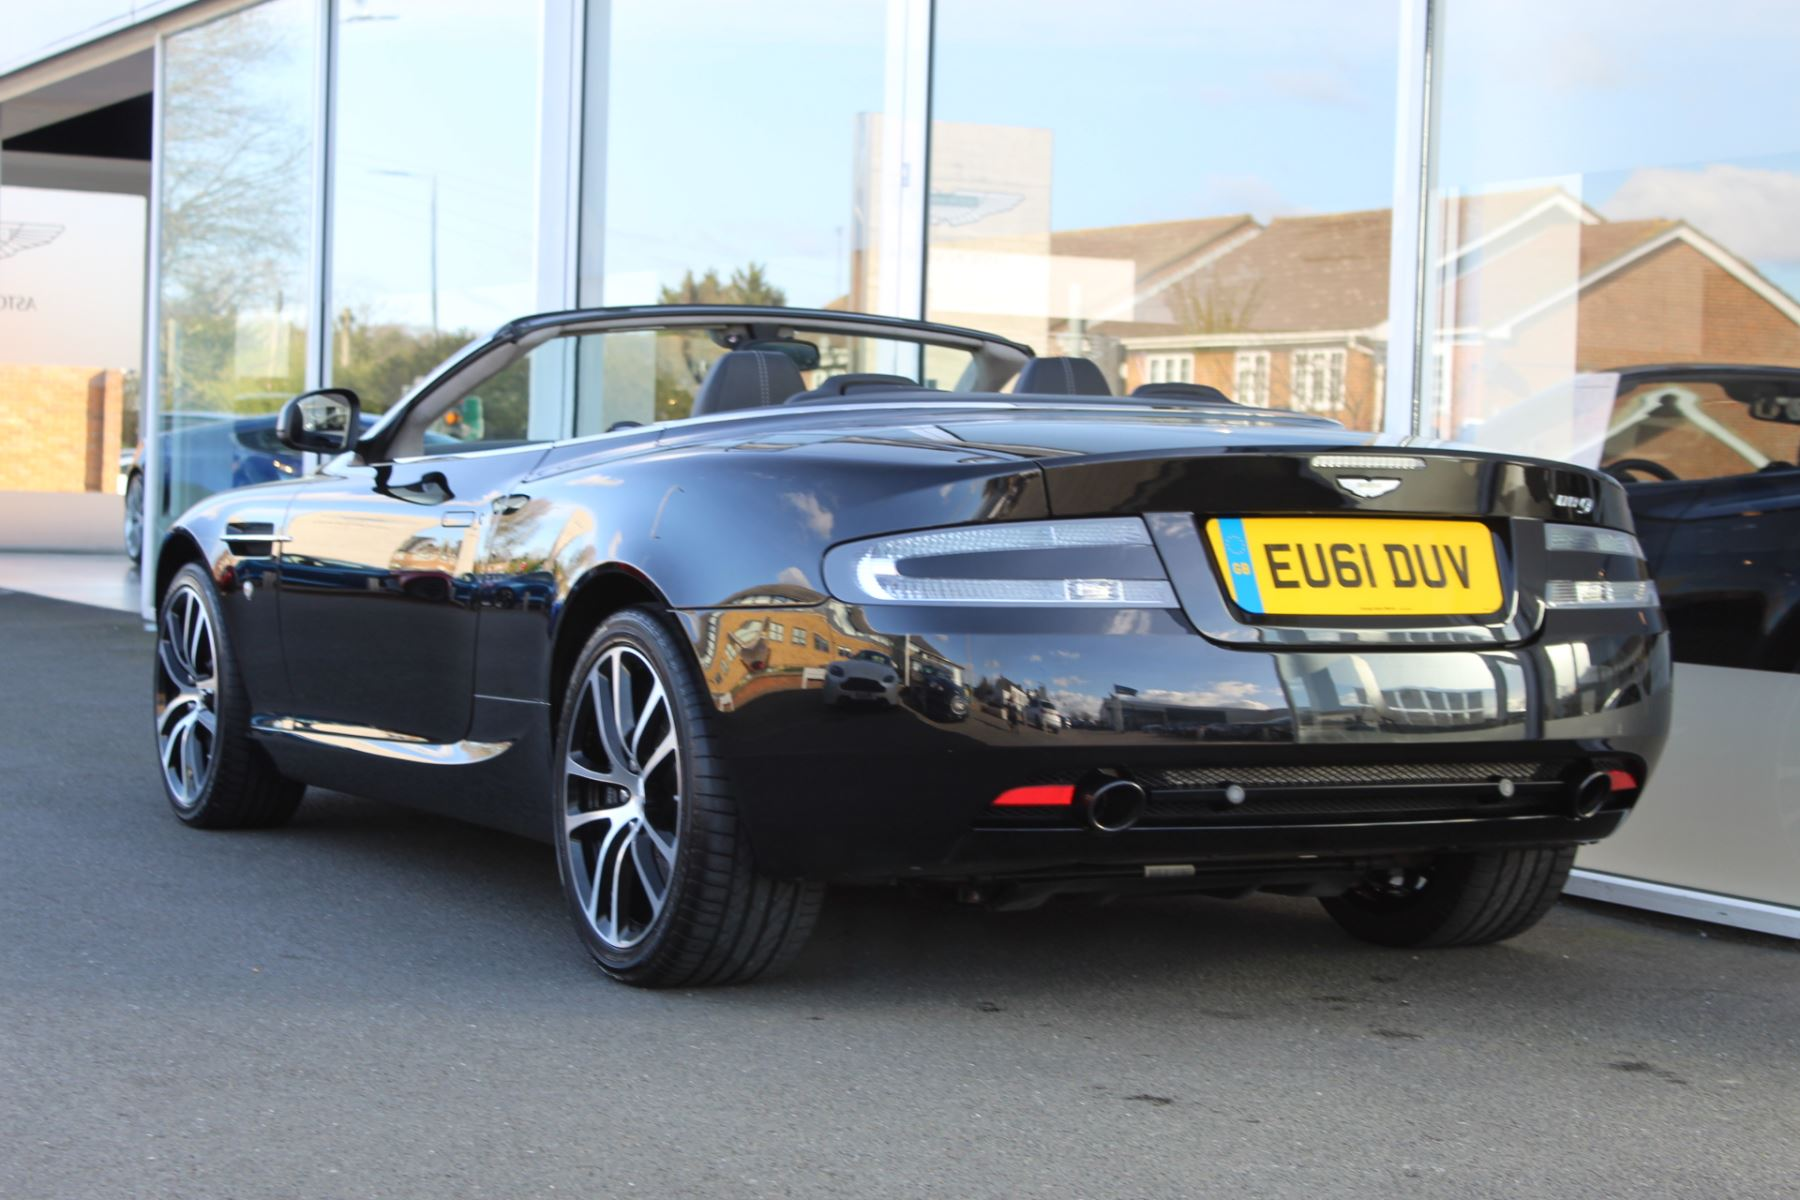 Aston Martin DB9 V12 2dr Volante Touchtronic [470] image 18